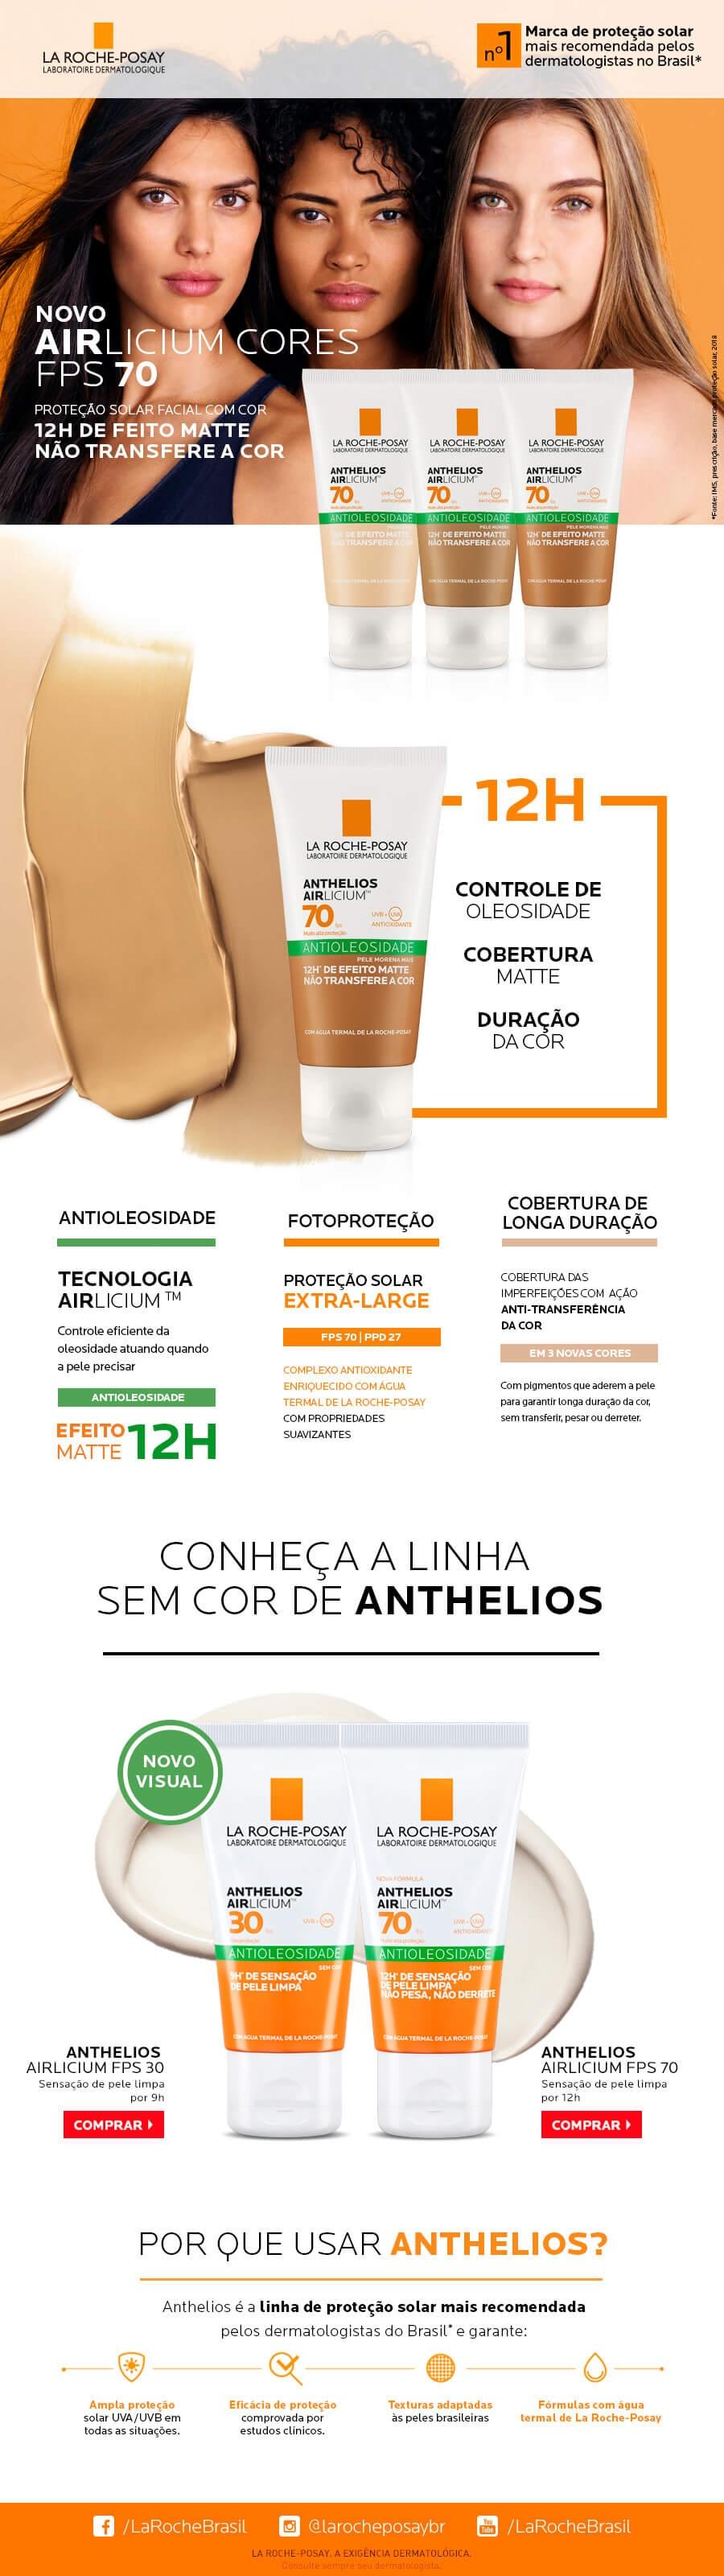 Lamina Protetor Solar Facial Anthelios Aircilium Antioleosidade F70